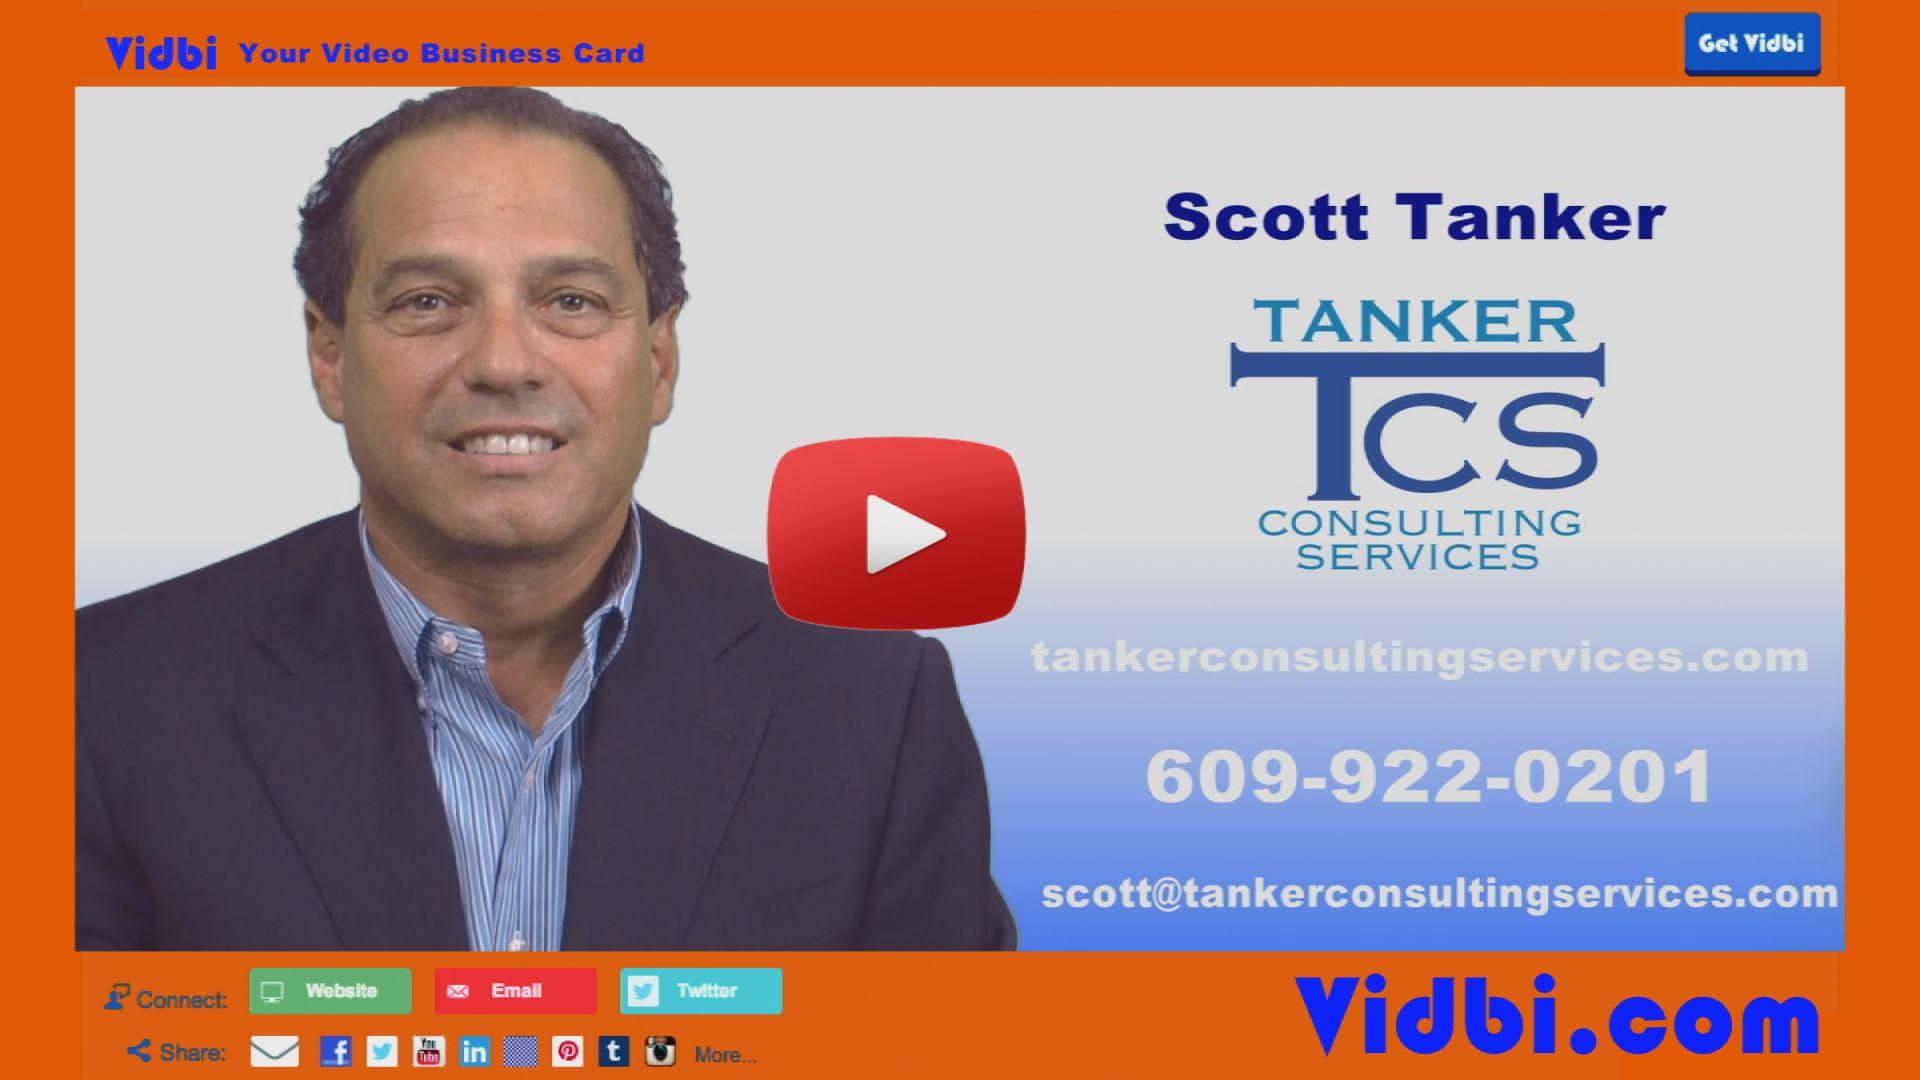 Scott Tanker - Tanker Consulting Services Vidbi